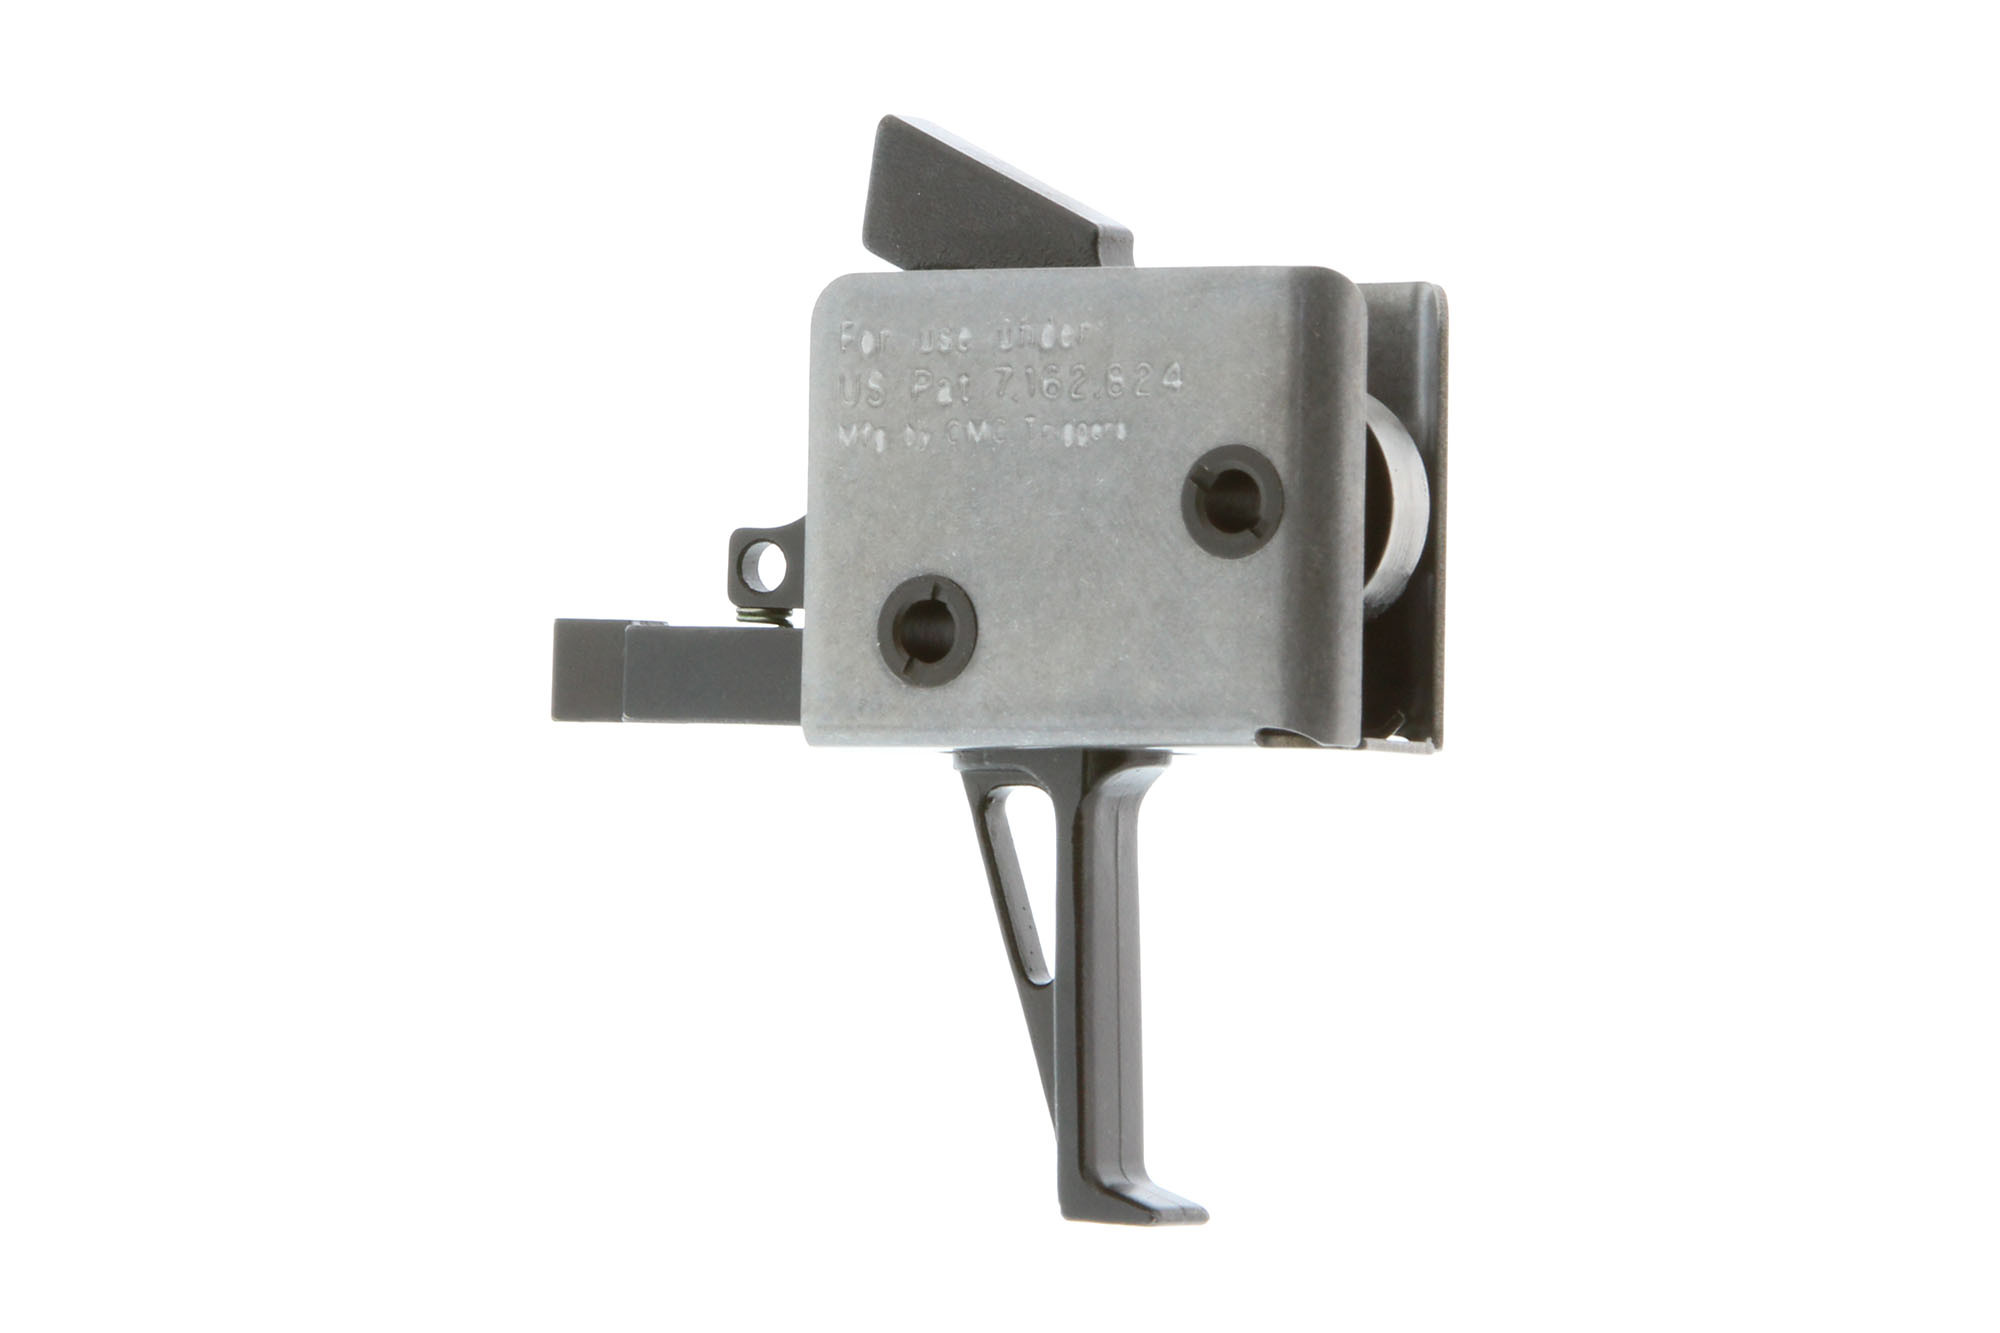 cmc-ar-15-ar-10-drop-in-single-stage-3-5lb-flat-trigger-mil-spec-154